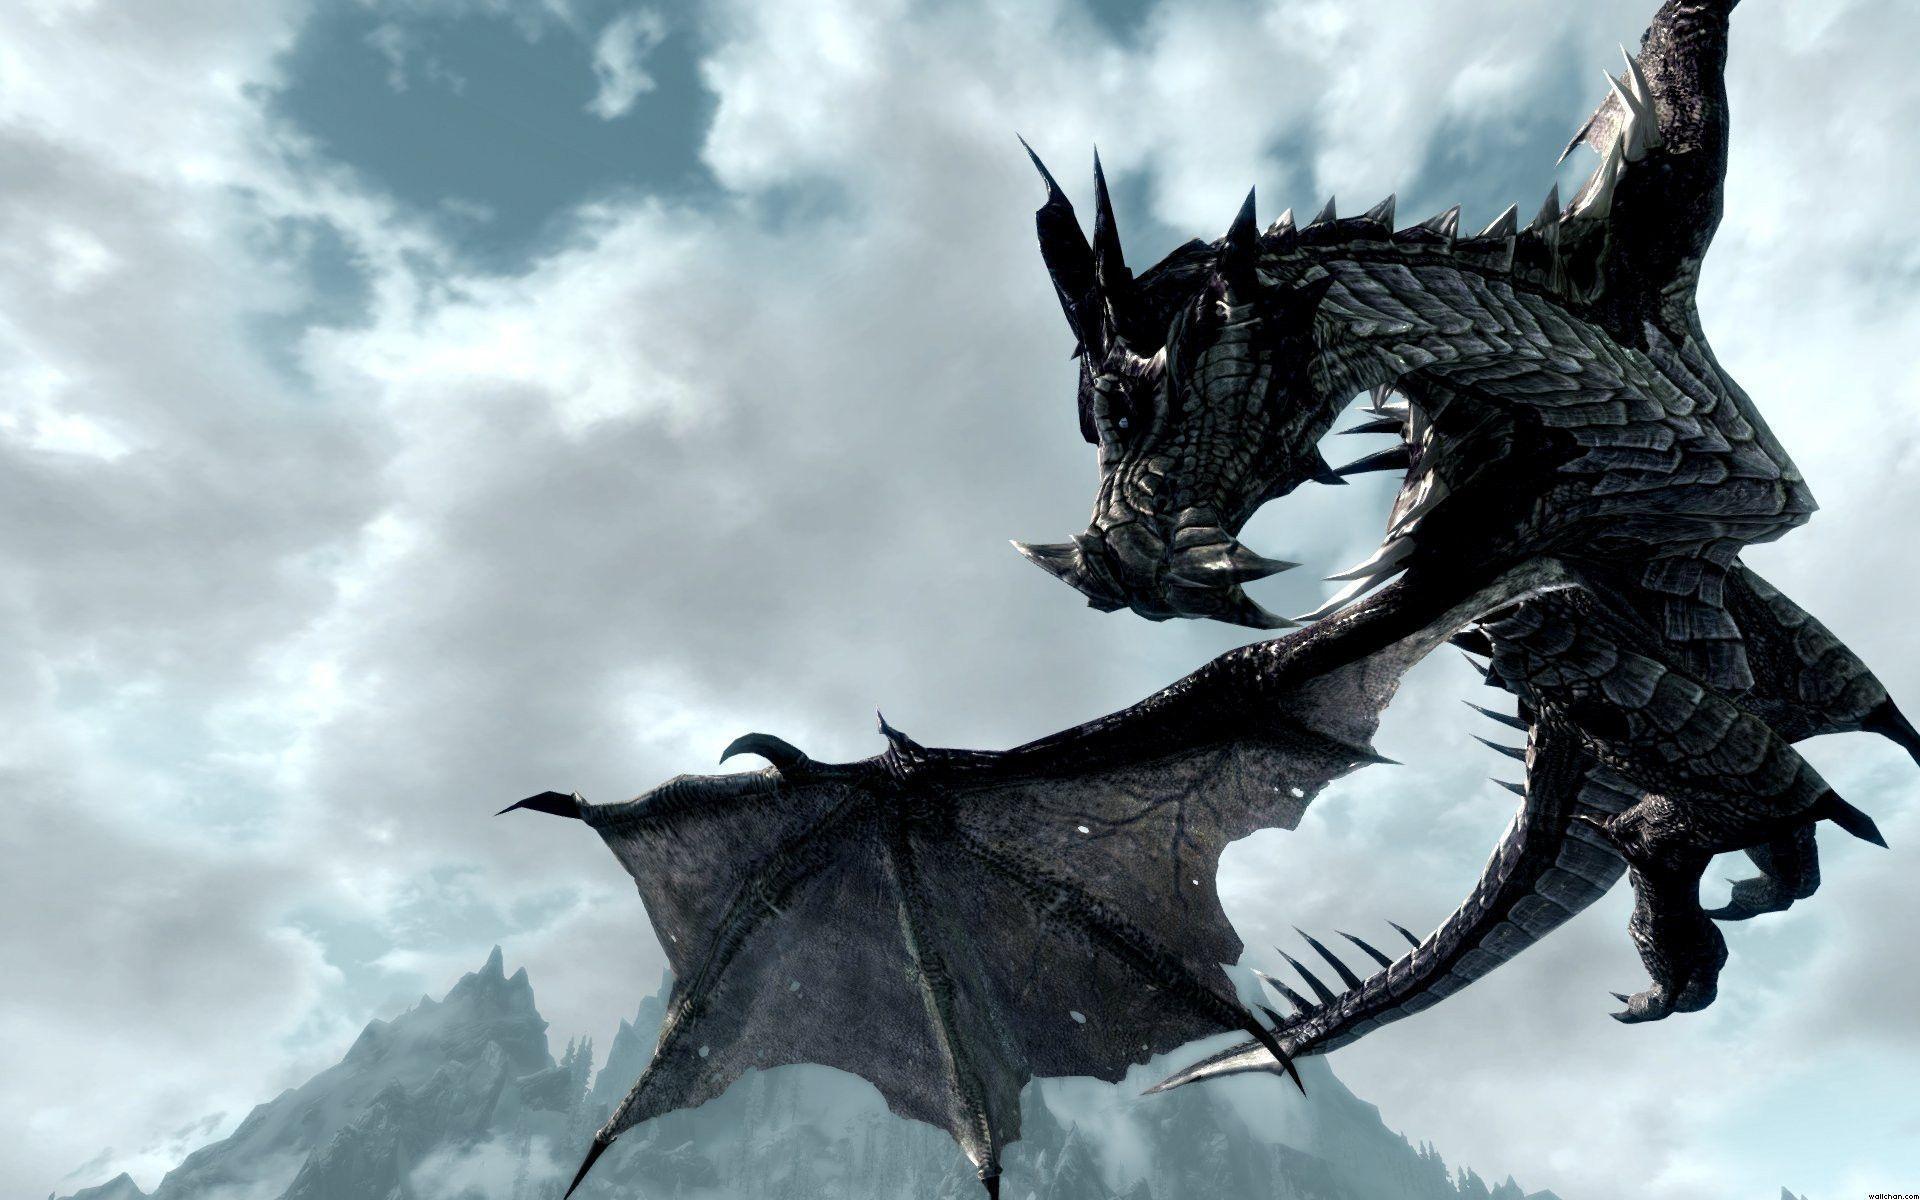 Hd wallpaper dragon - Flying Dragon Exclusive Hd Wallpapers 4295